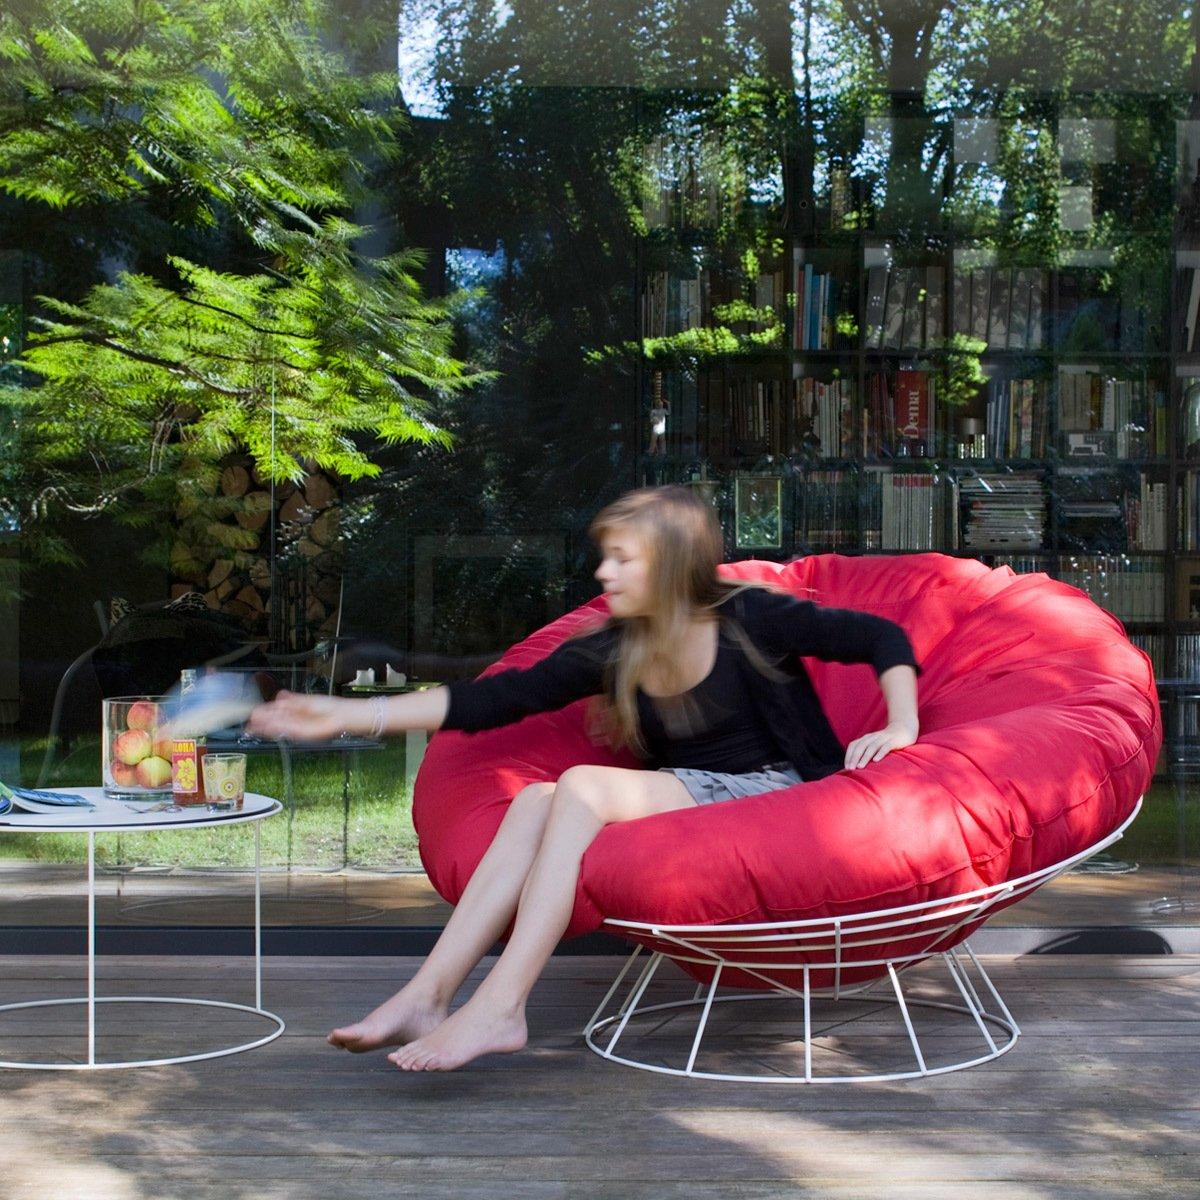 Sitting Bull 140102 Sitzsack mit Gestell Bull's Nest / Outdoor / ø 140 x H 40 cm / rot